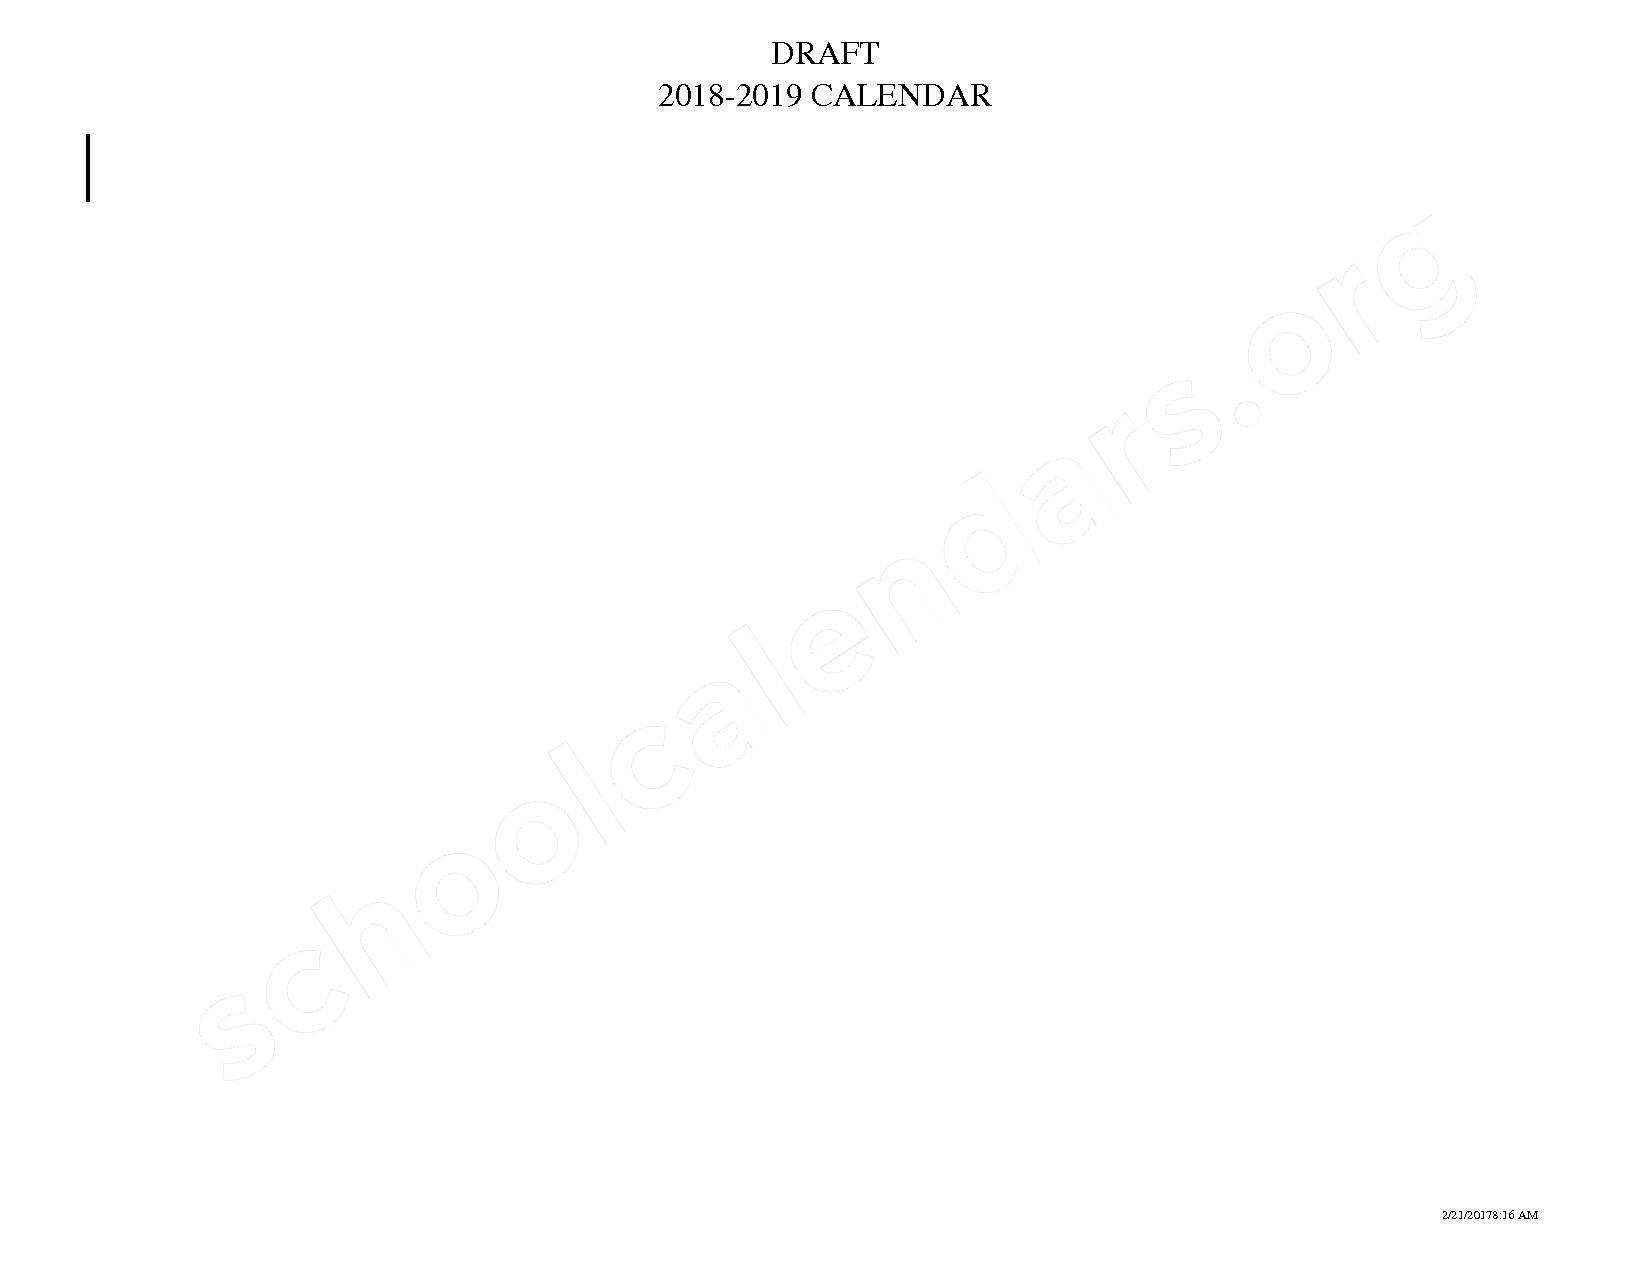 2018 - 2019 School Calendar (draft) – Greenwood School District 50 – page 2